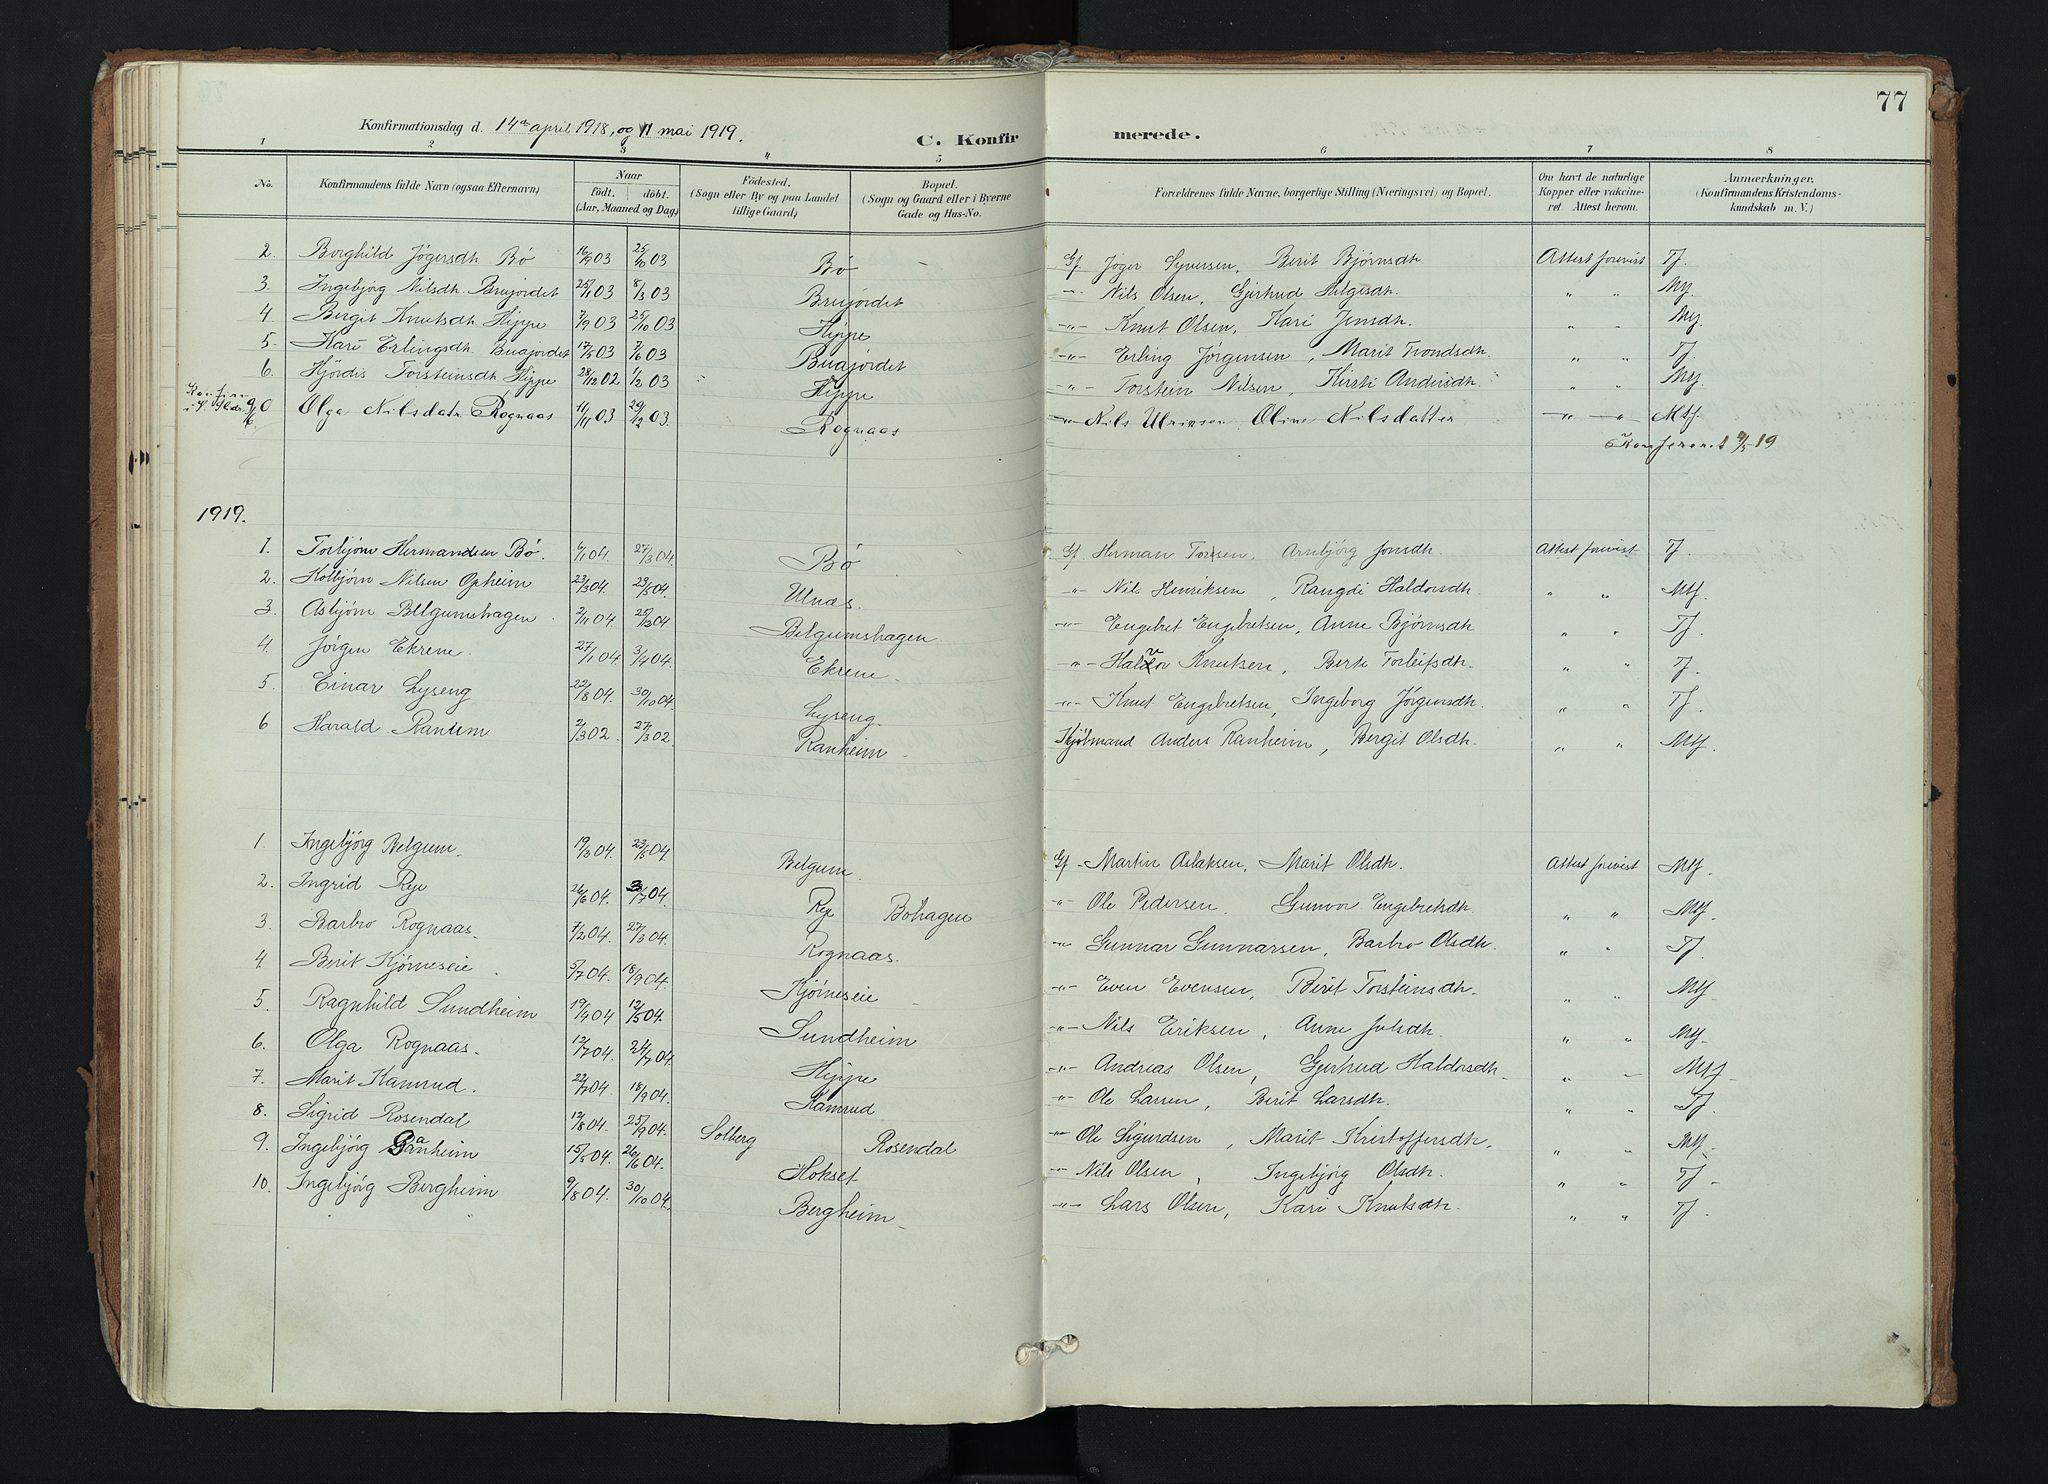 SAH, Nord-Aurdal prestekontor, Ministerialbok nr. 17, 1897-1926, s. 77